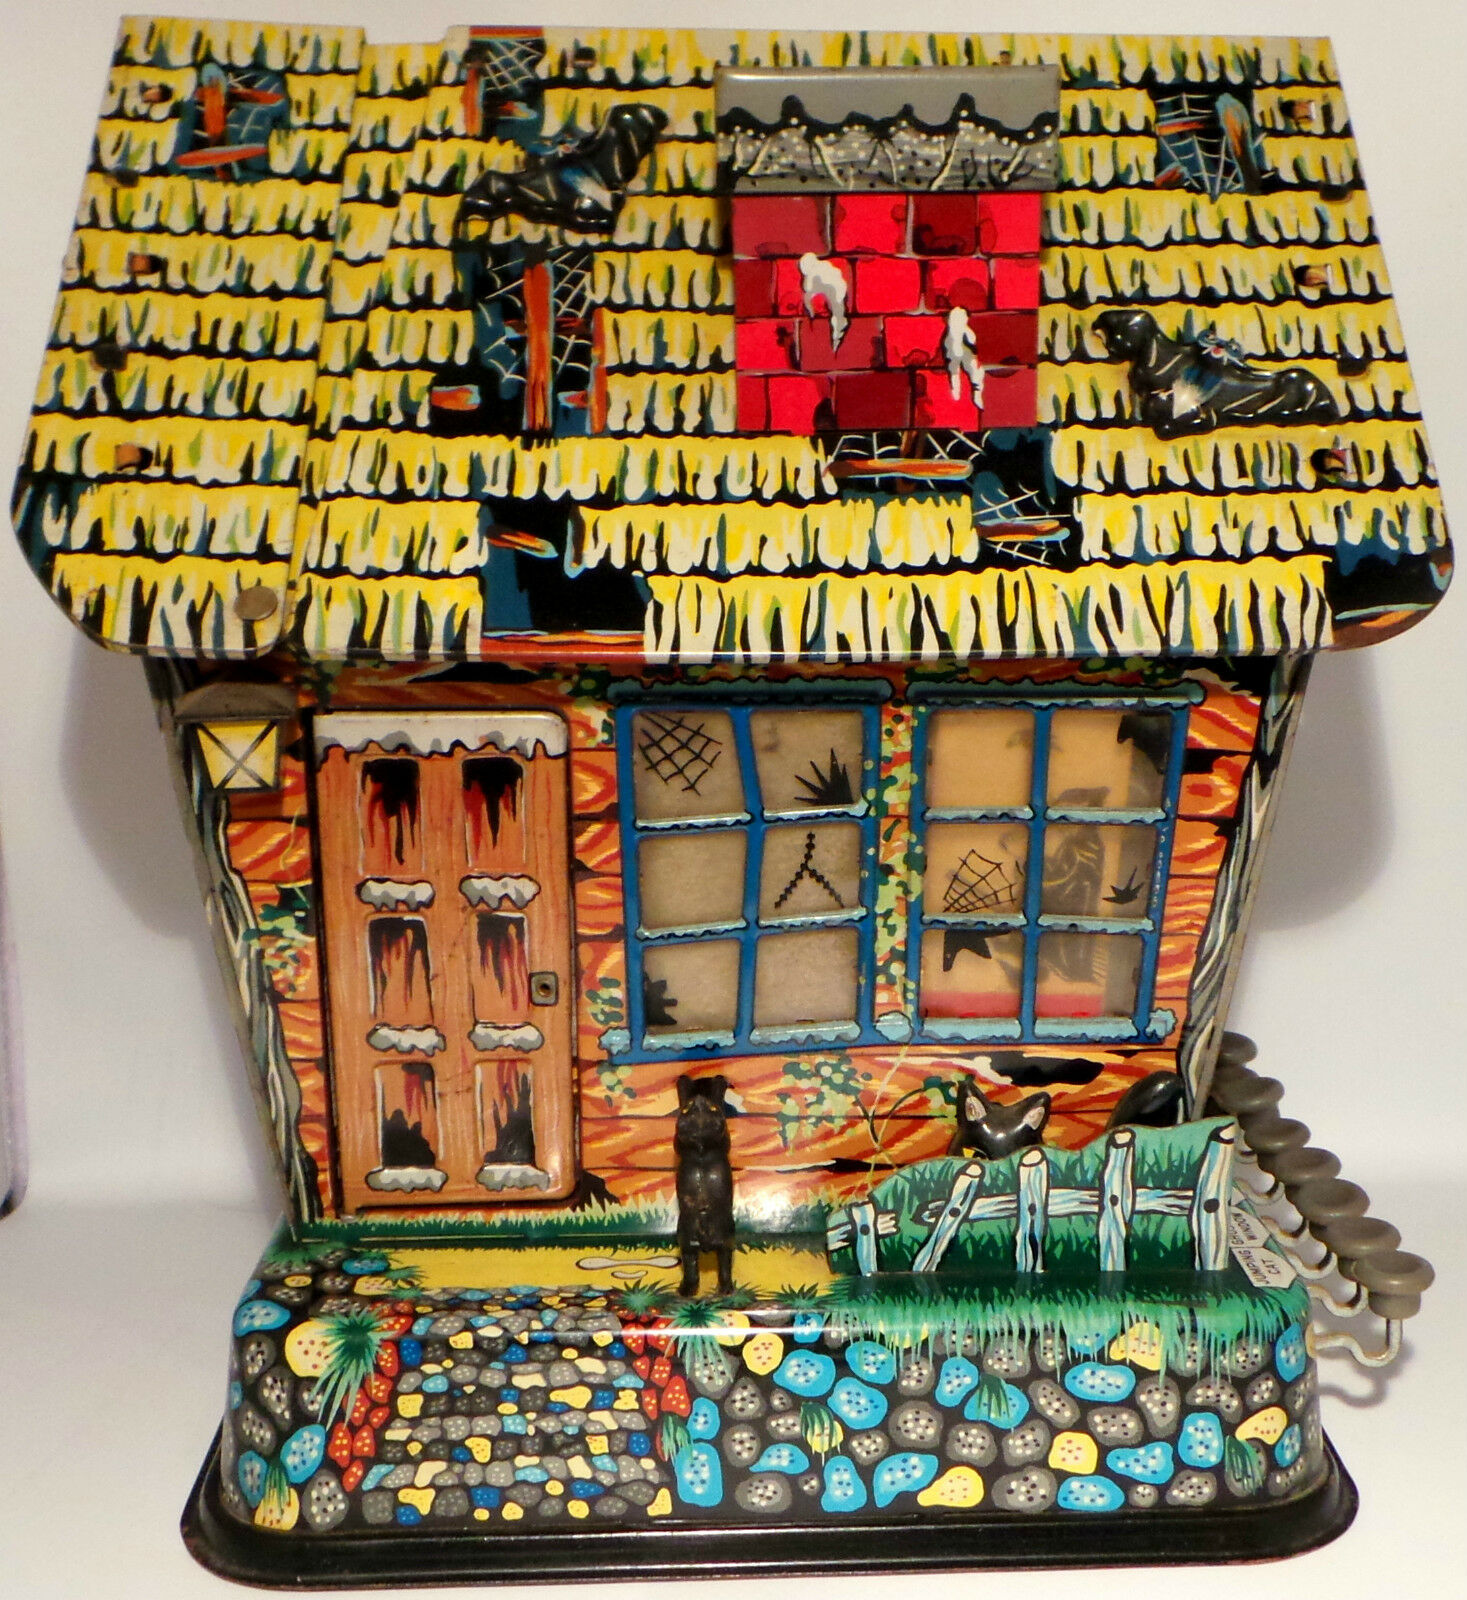 HORROR   MARX TOYS - TINPLATE HAUNTED HOUSE MODEL MADE CIRCA 1960'S. (MLFP)